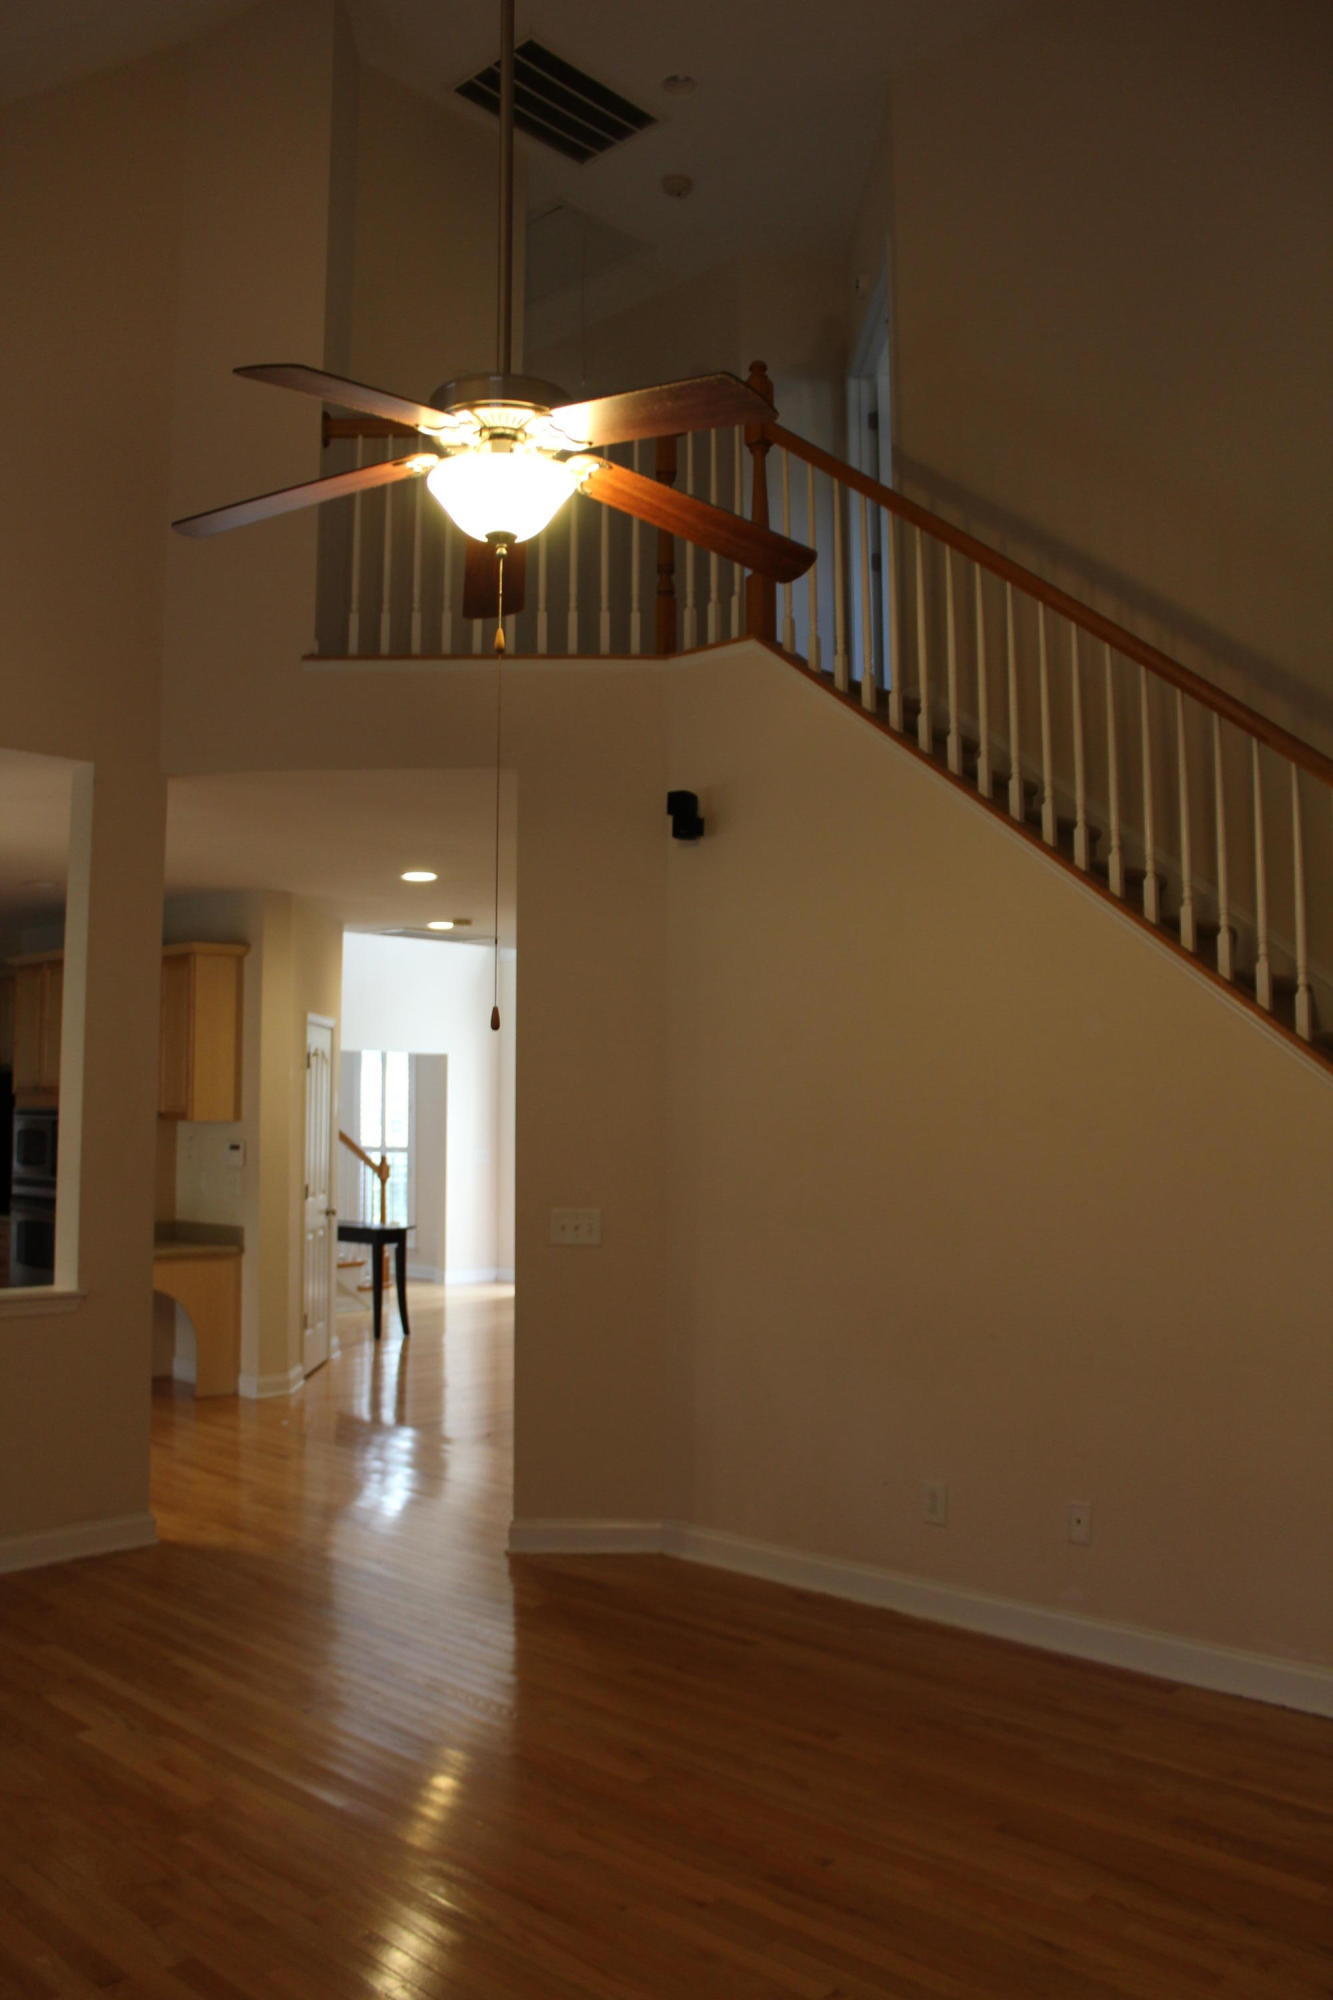 Hunt Club Phase II Homes For Sale - 1220 Walleye, Charleston, SC - 0